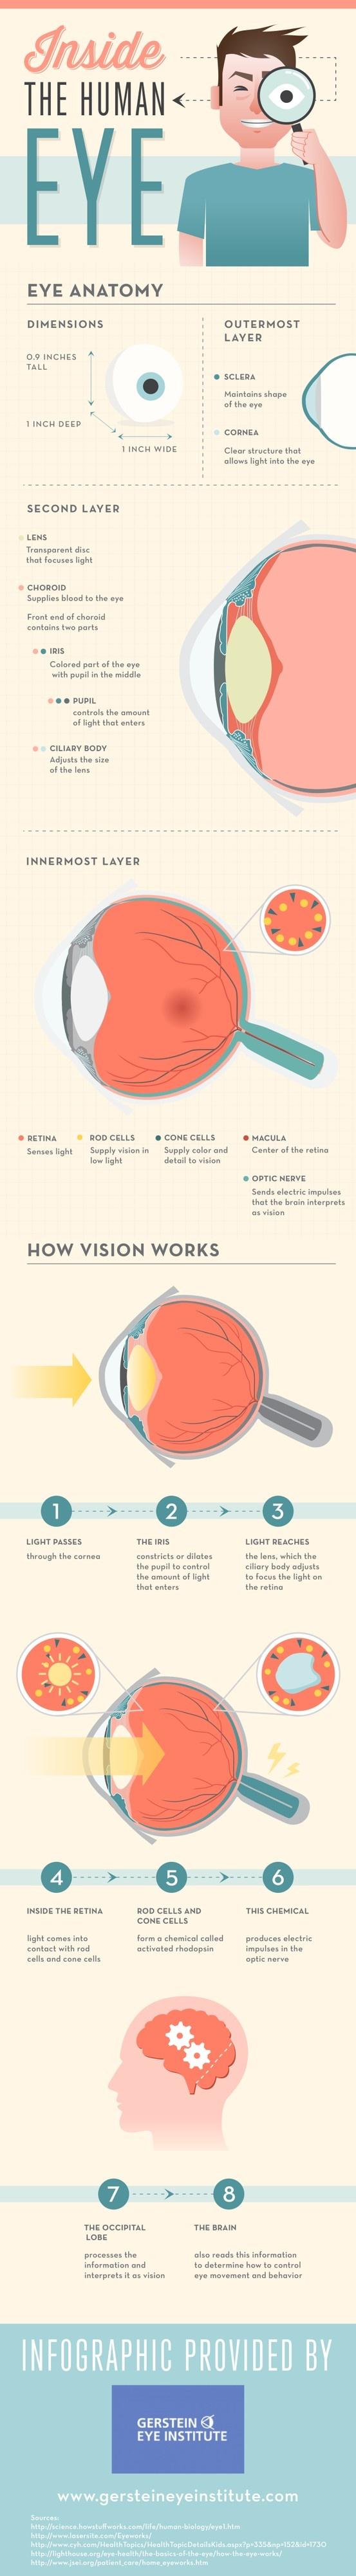 Inside the human eye #infografia #infographic #health